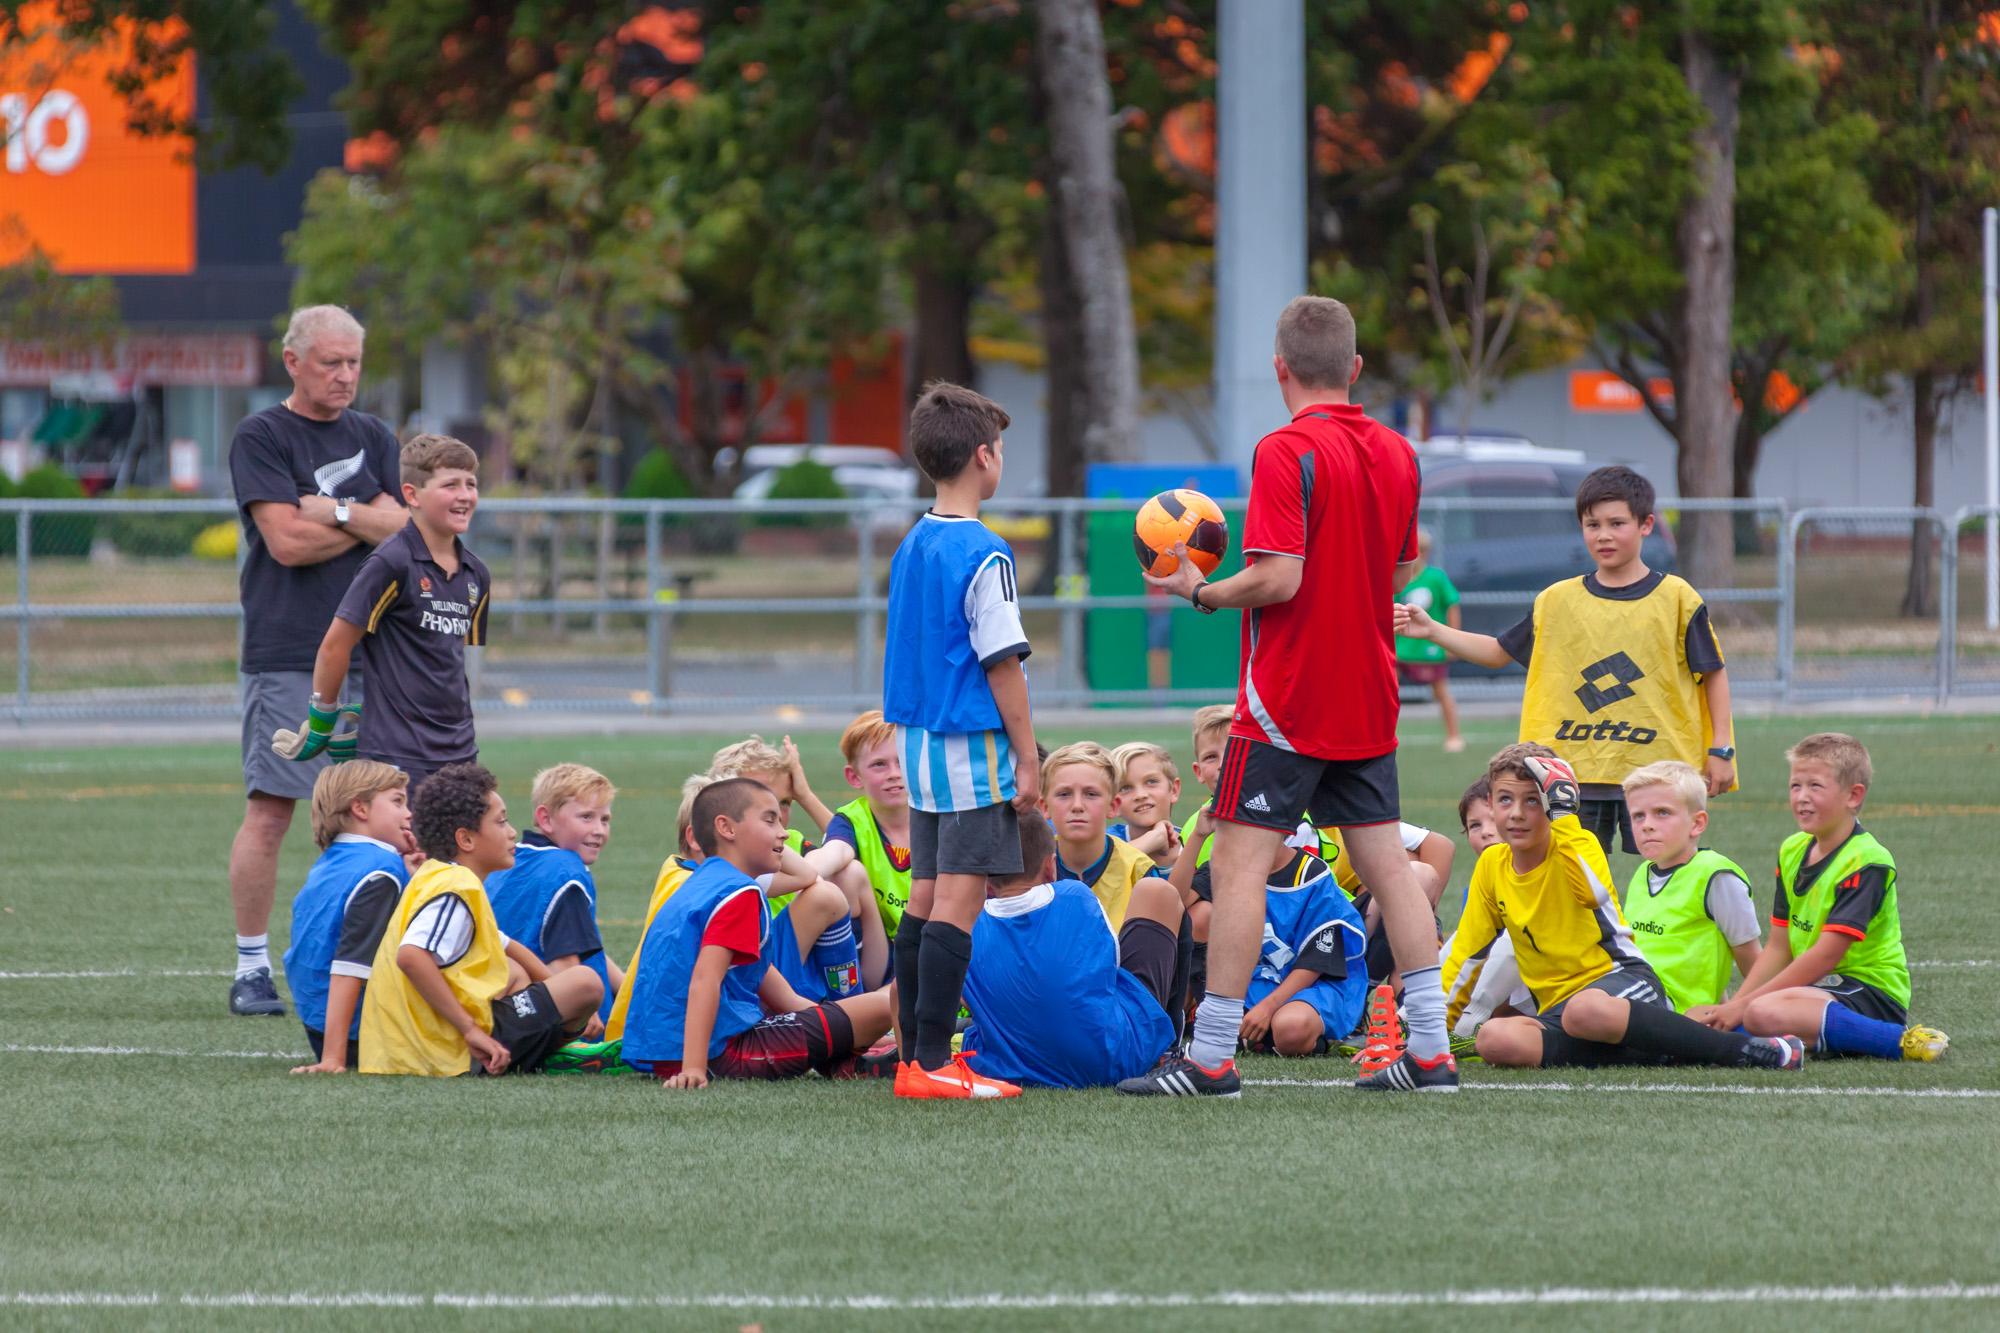 UHCC Soccer Coach 4493